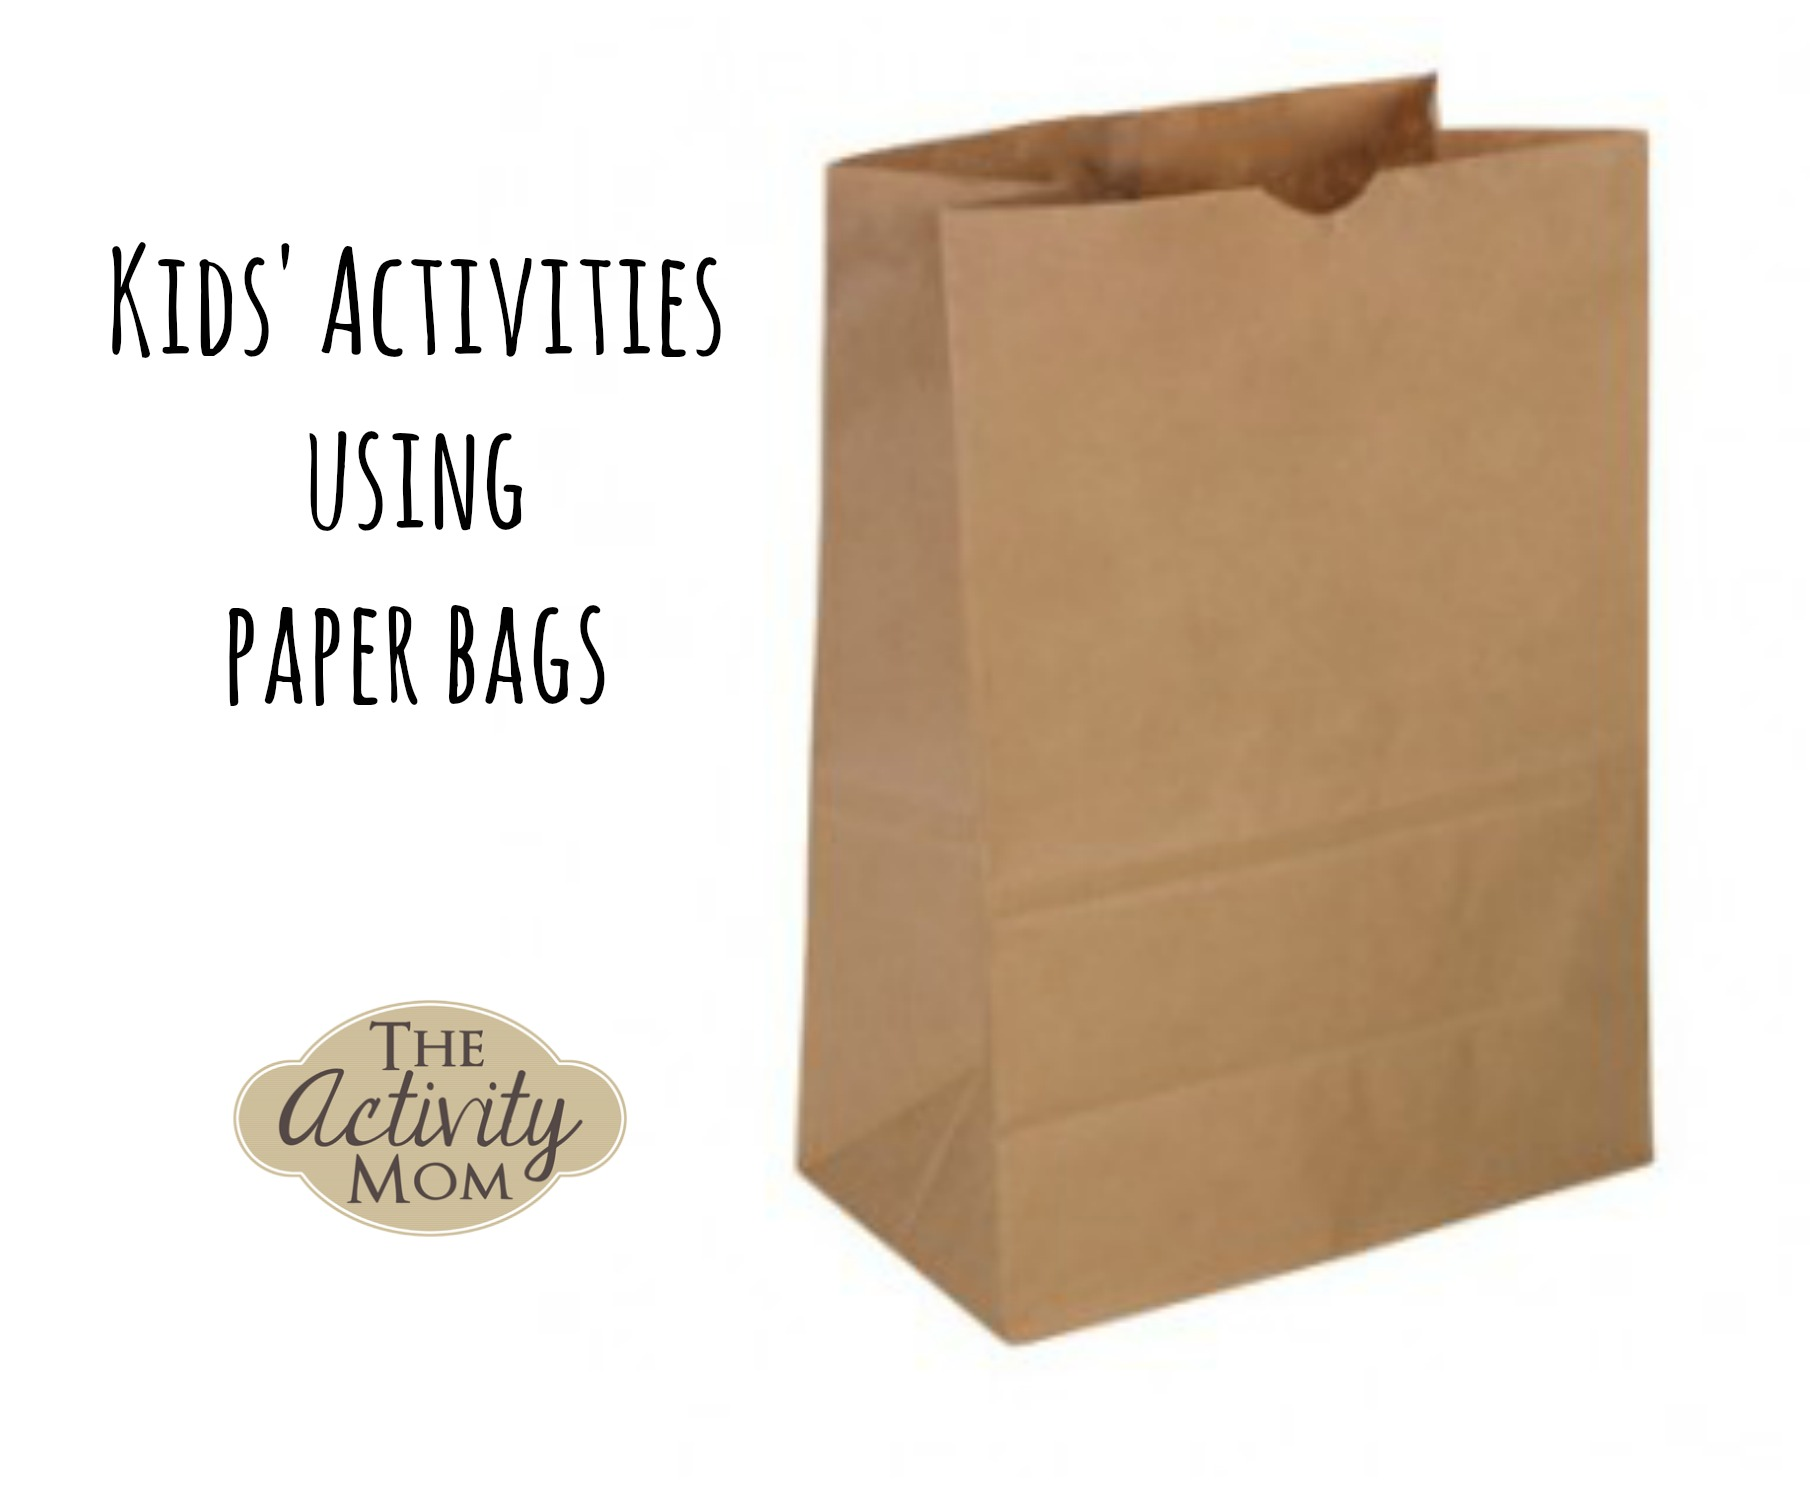 Paper bag activity - Kids Activities Using Paper Bags